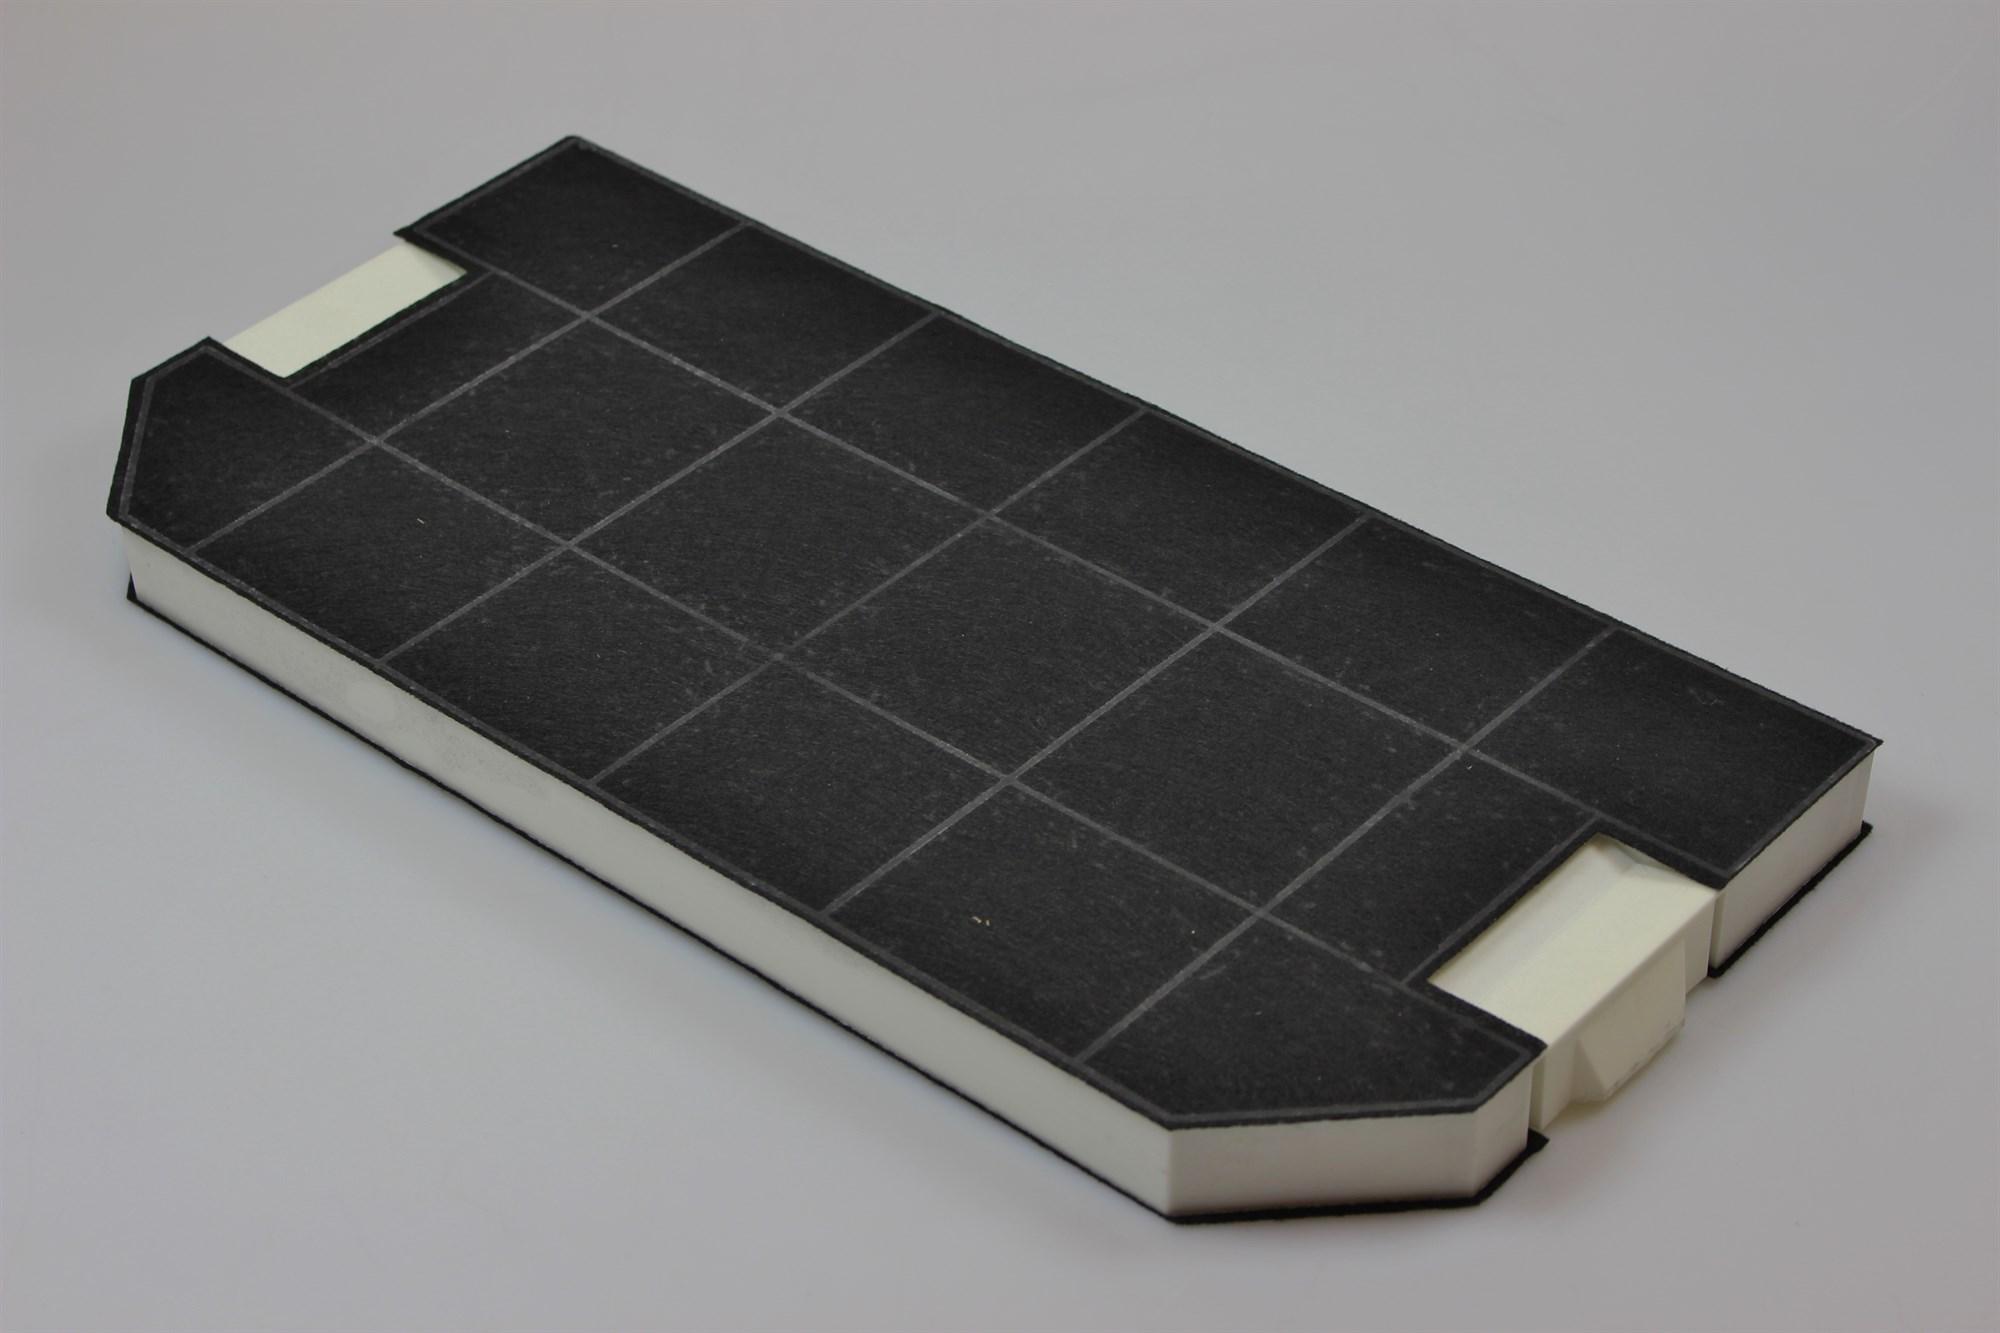 Kohlefilter siemens dunstabzugshaube 500 mm x 234 mm 1 stck